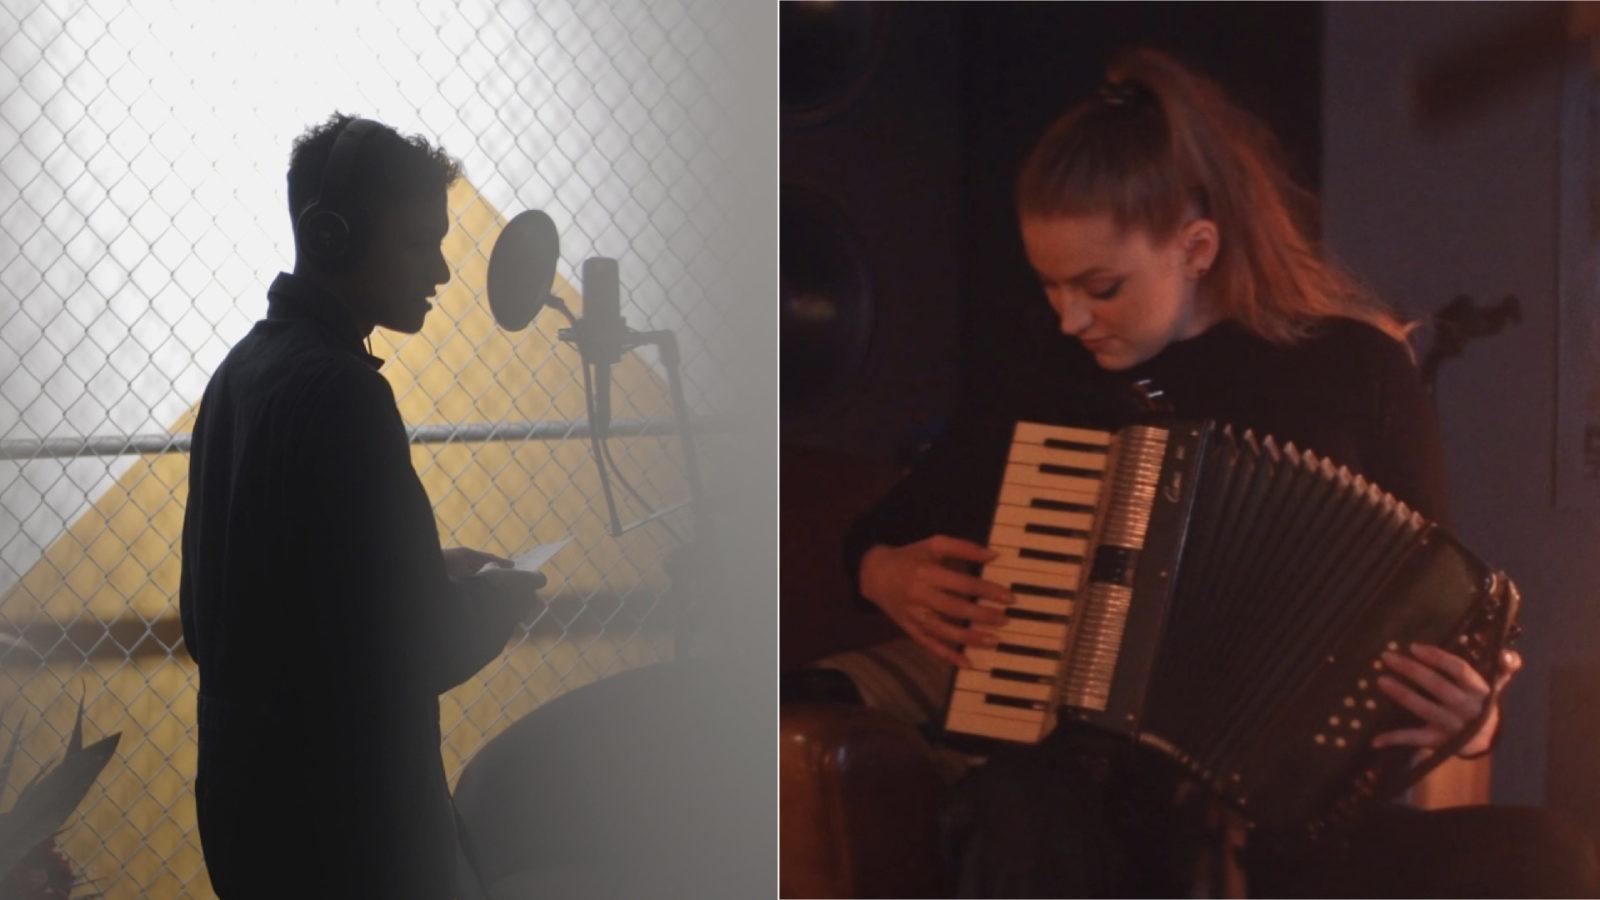 Audemars Piguet 的音樂邂逅:與名人跨界合作共譜《180》音樂系列影集